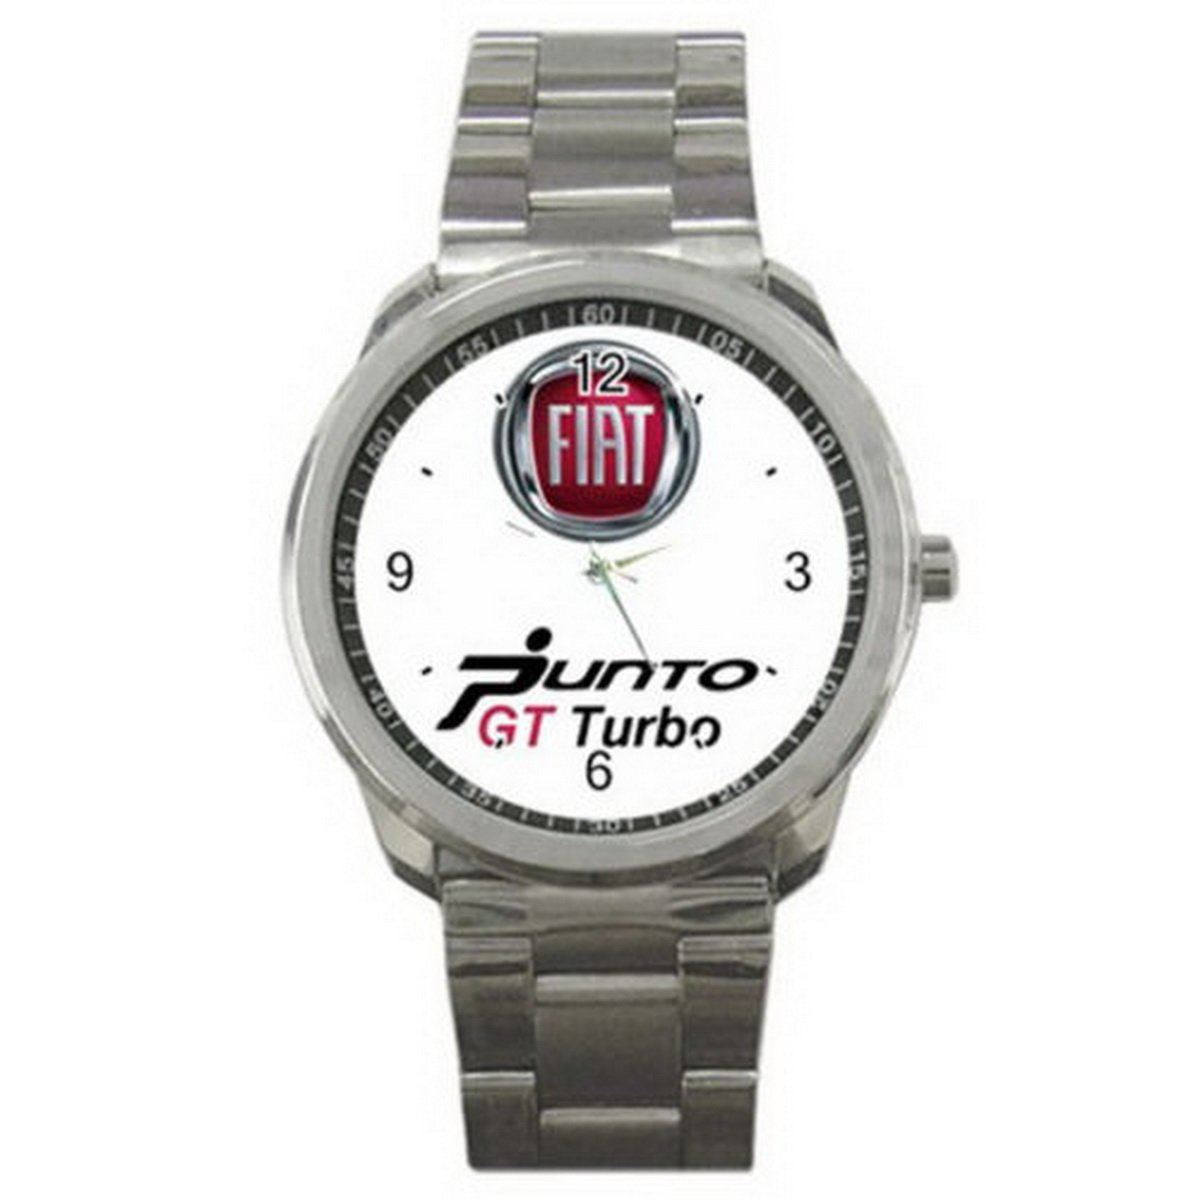 Relojes de pulsera hombres frysc060 Custom New Item Fiat Punto GT Turbo design for Sport Metal Watch: Amazon.es: Relojes